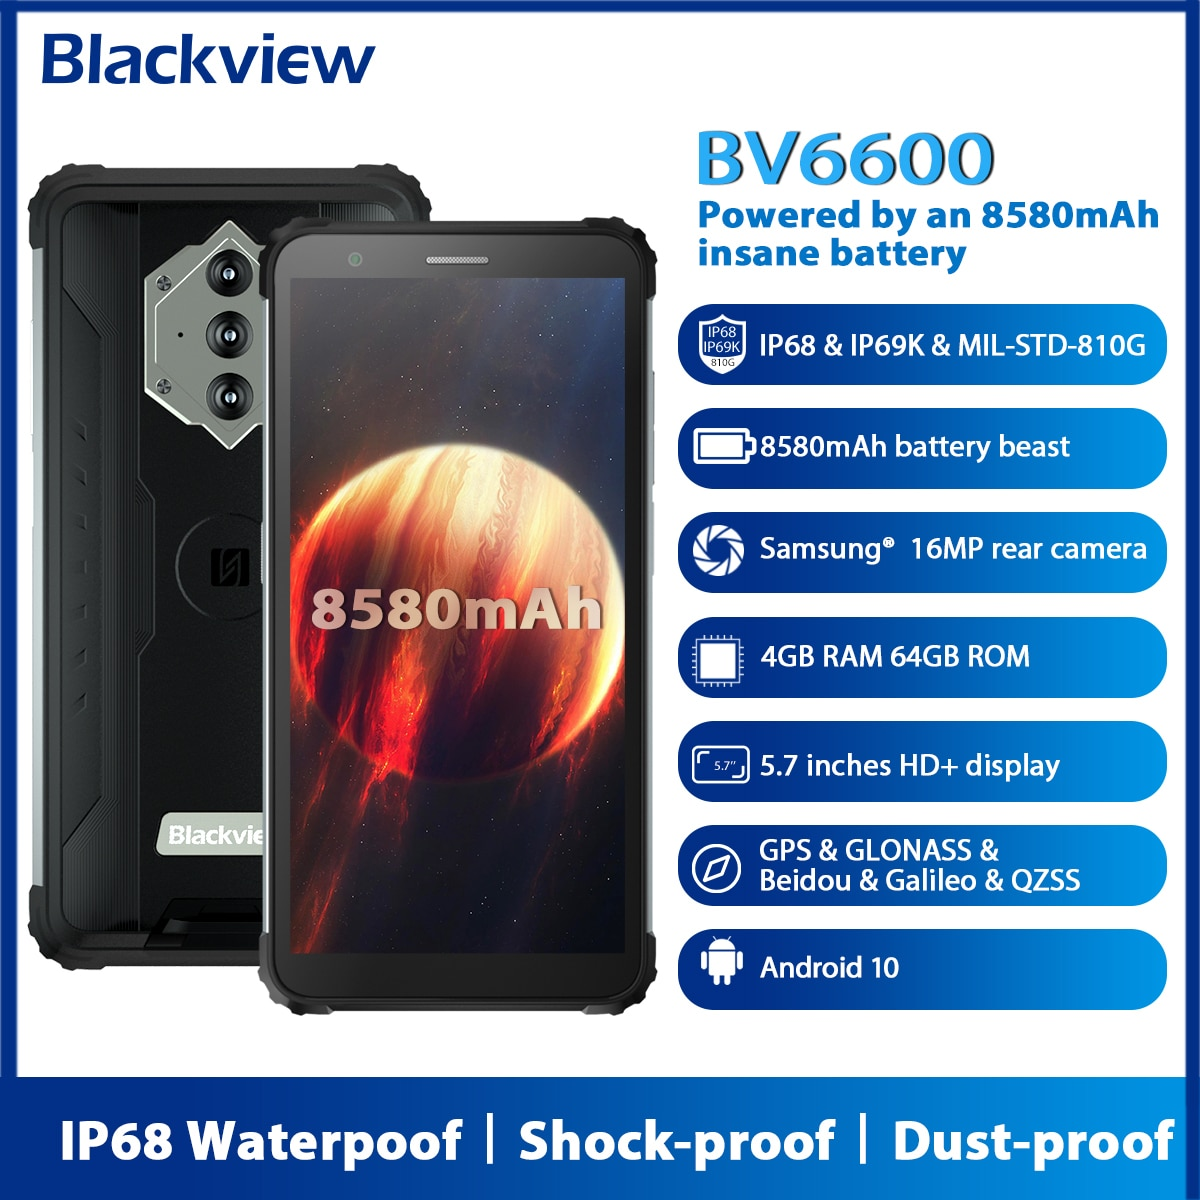 Blackview BV6600 Android 10 прочный смартфон IP68 Водонепроницаемый 8580 мАч Octa Core 4 Гб + 64 Гб 5,7 дюйм FHD мобильный телефон 16MP Камера NFC